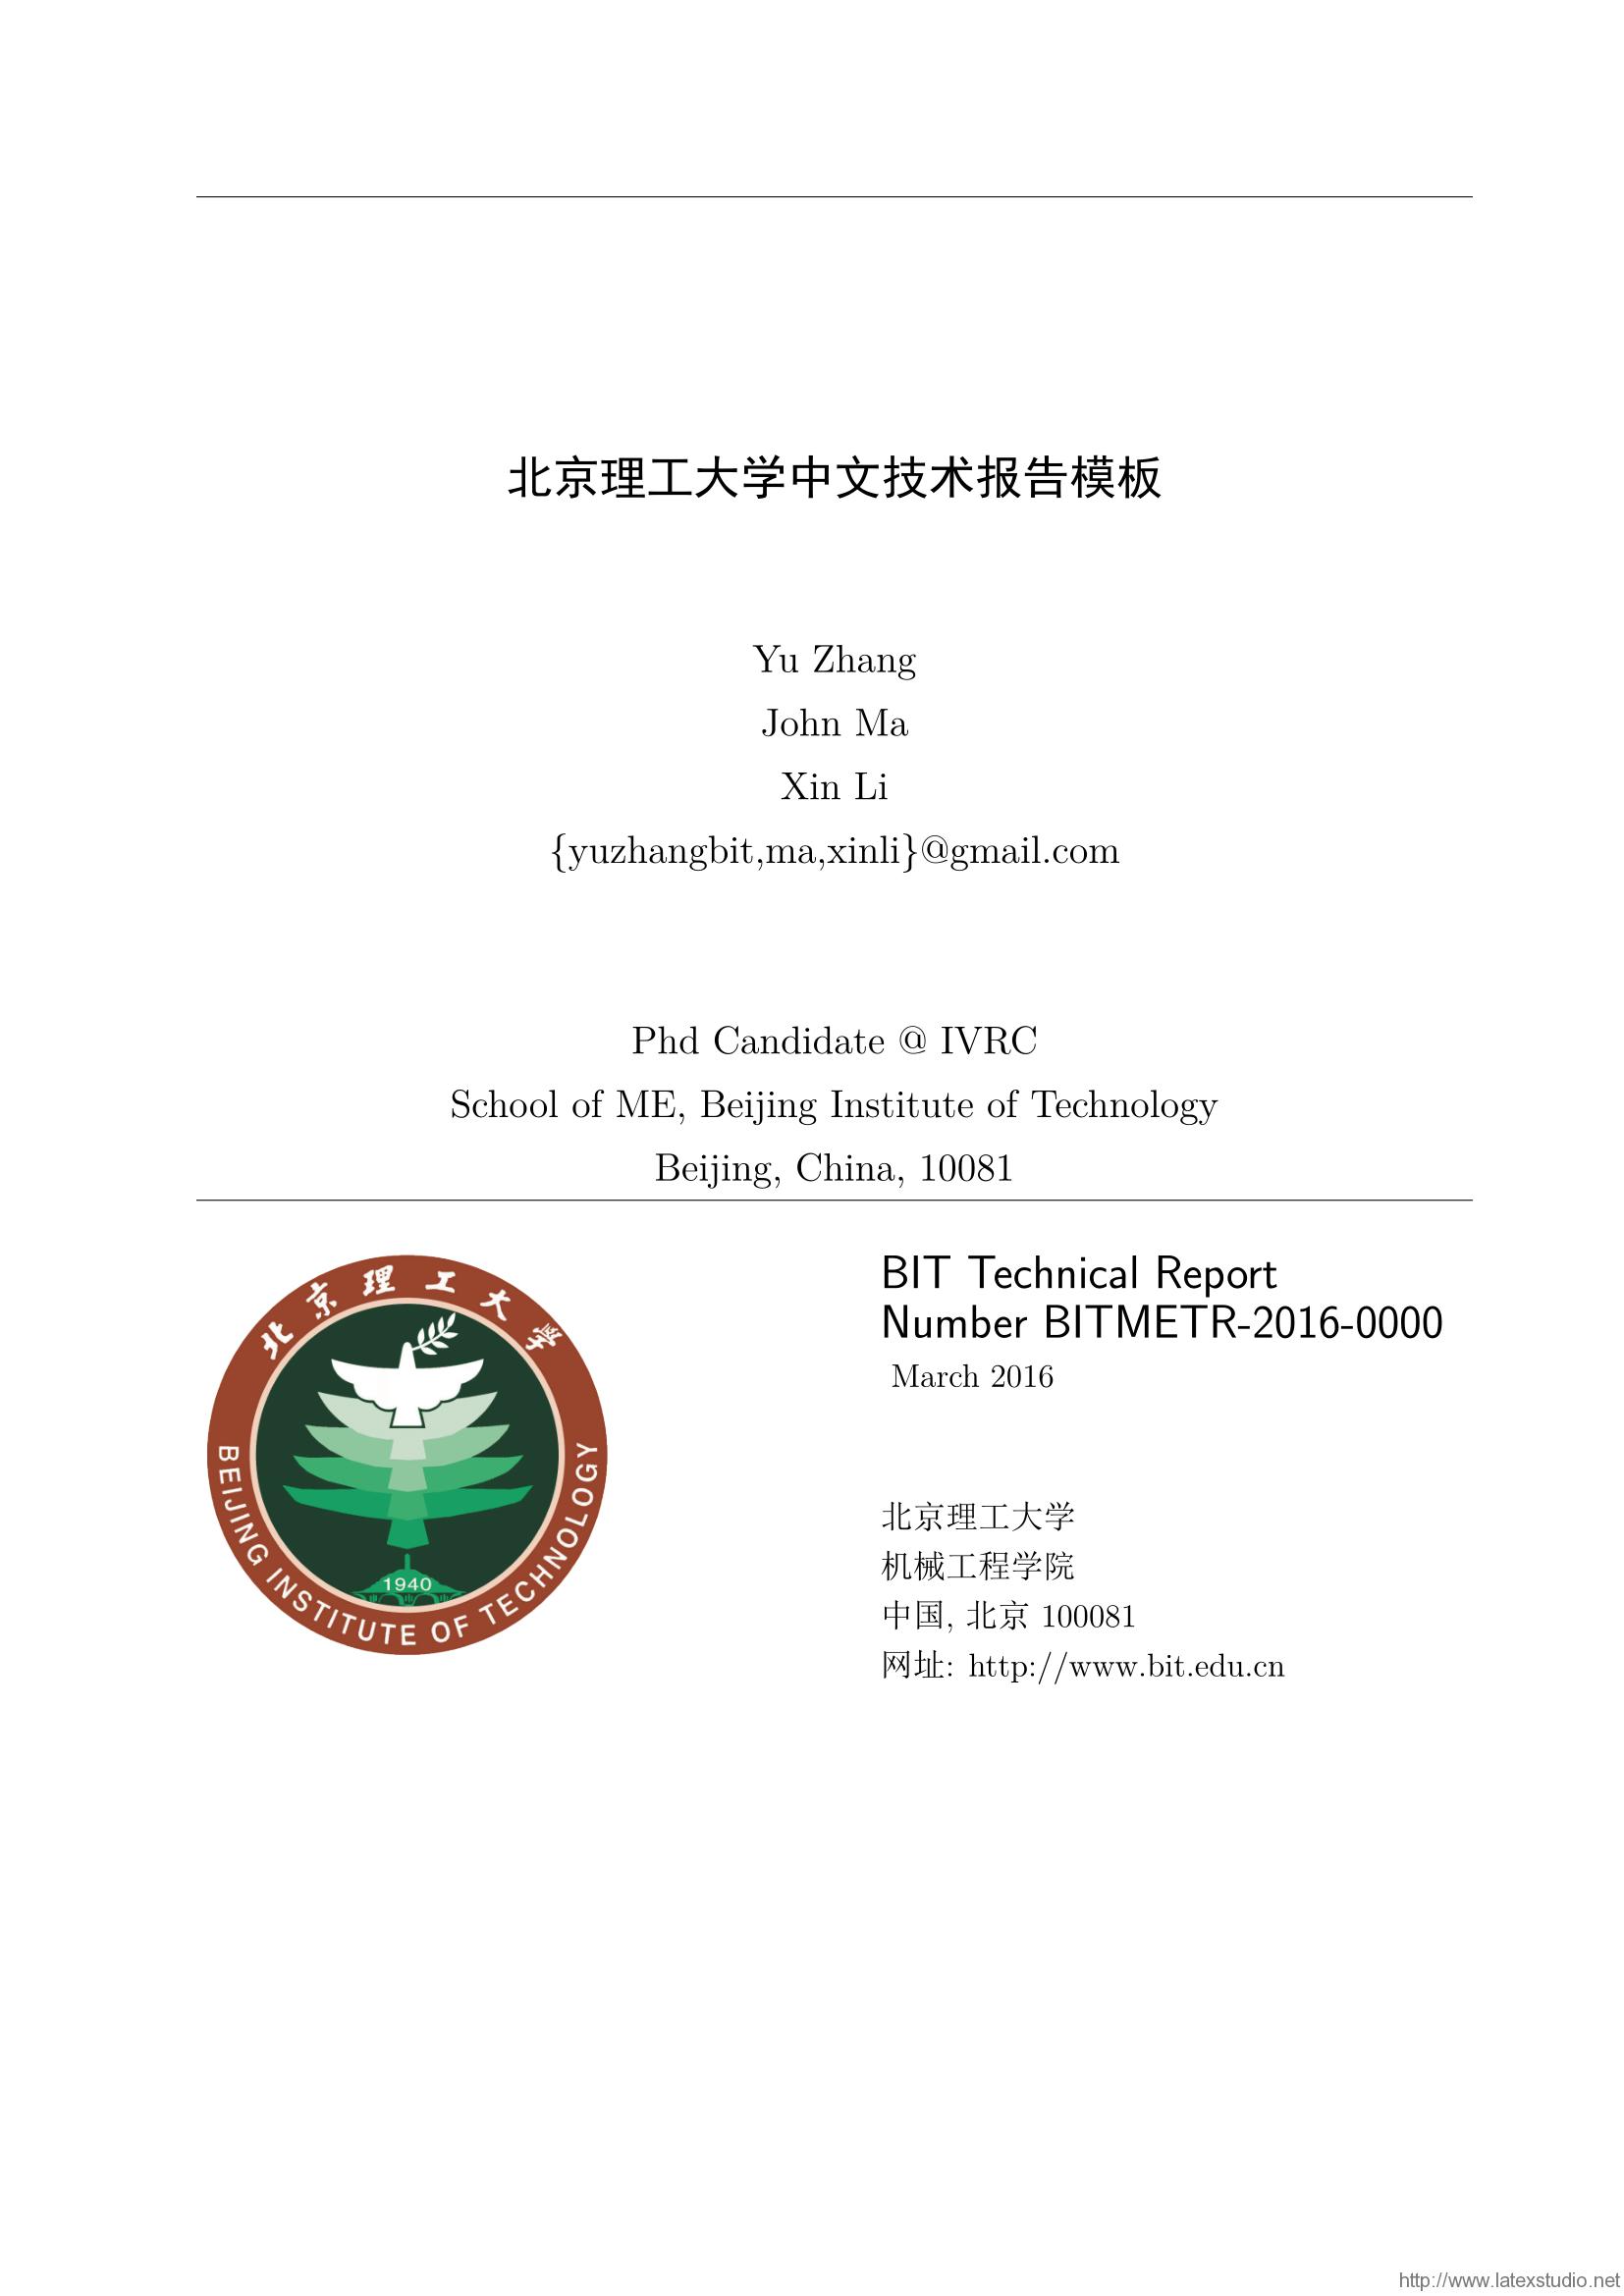 BIT_TechRep-1